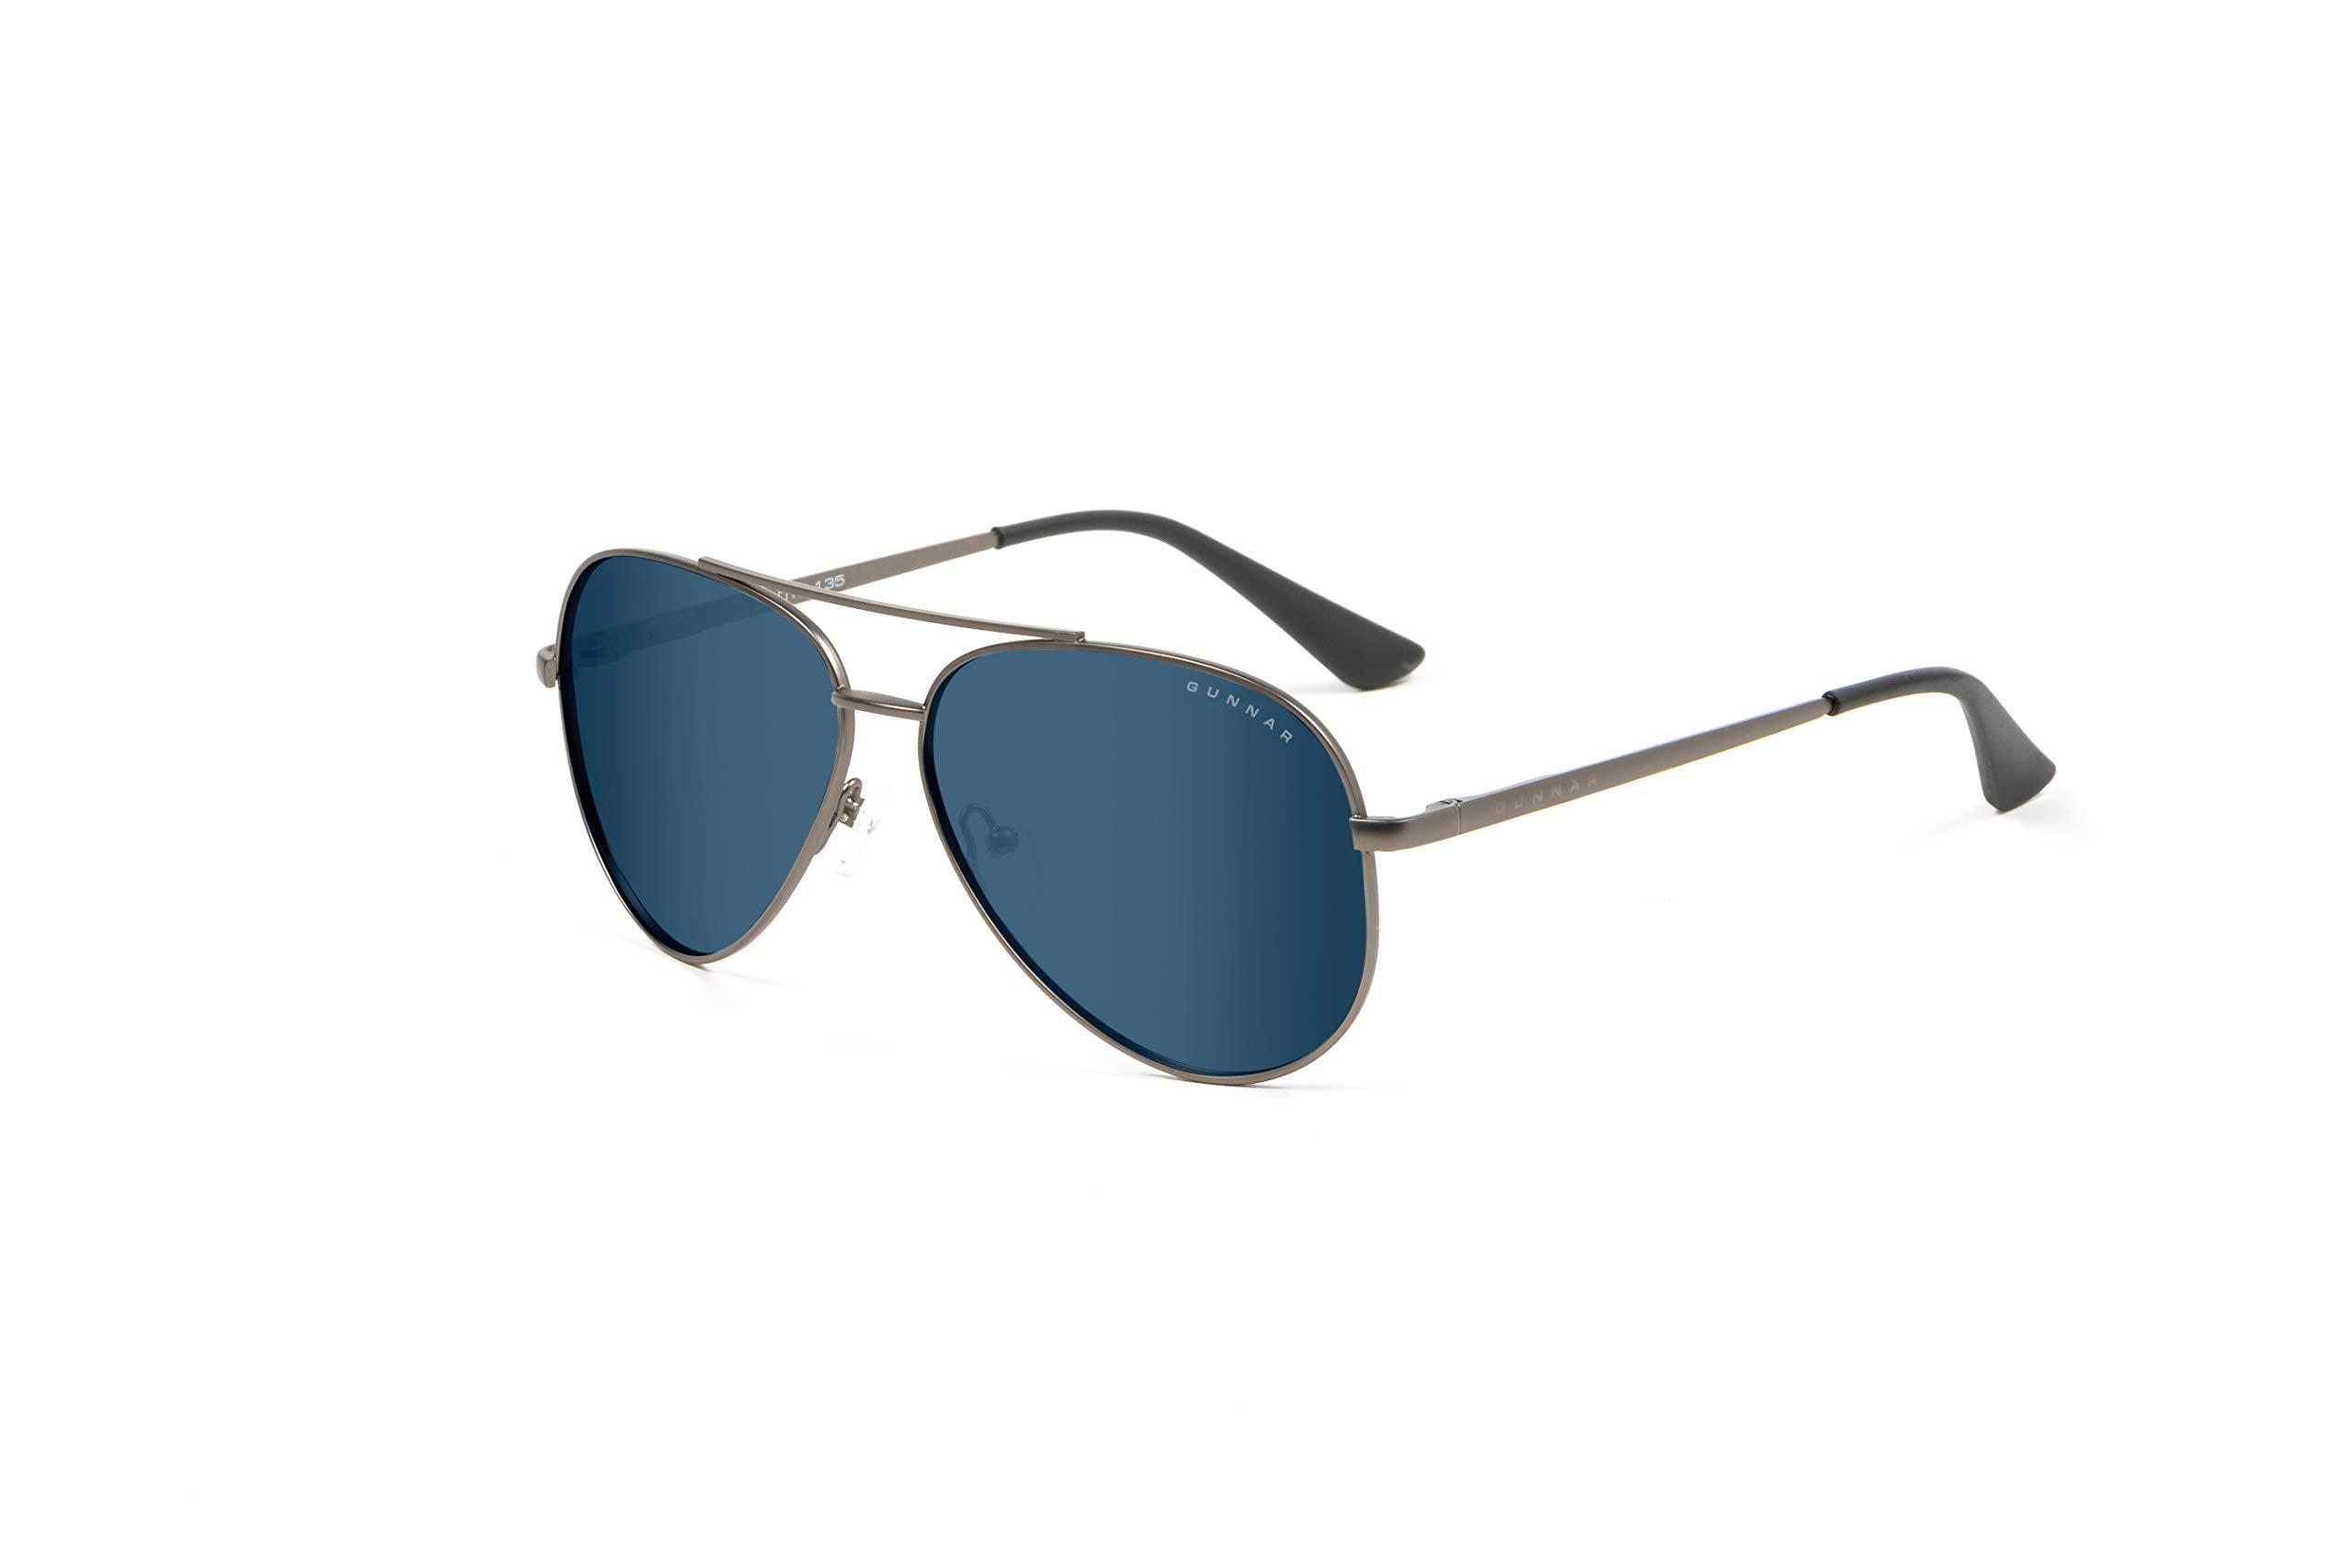 GUNNAR Gaming and Computer Eyewear /Maverick Sunglasses - Patented Lens, Reduce Digital Eye Strain, Block 90% of Harmful Blue Light